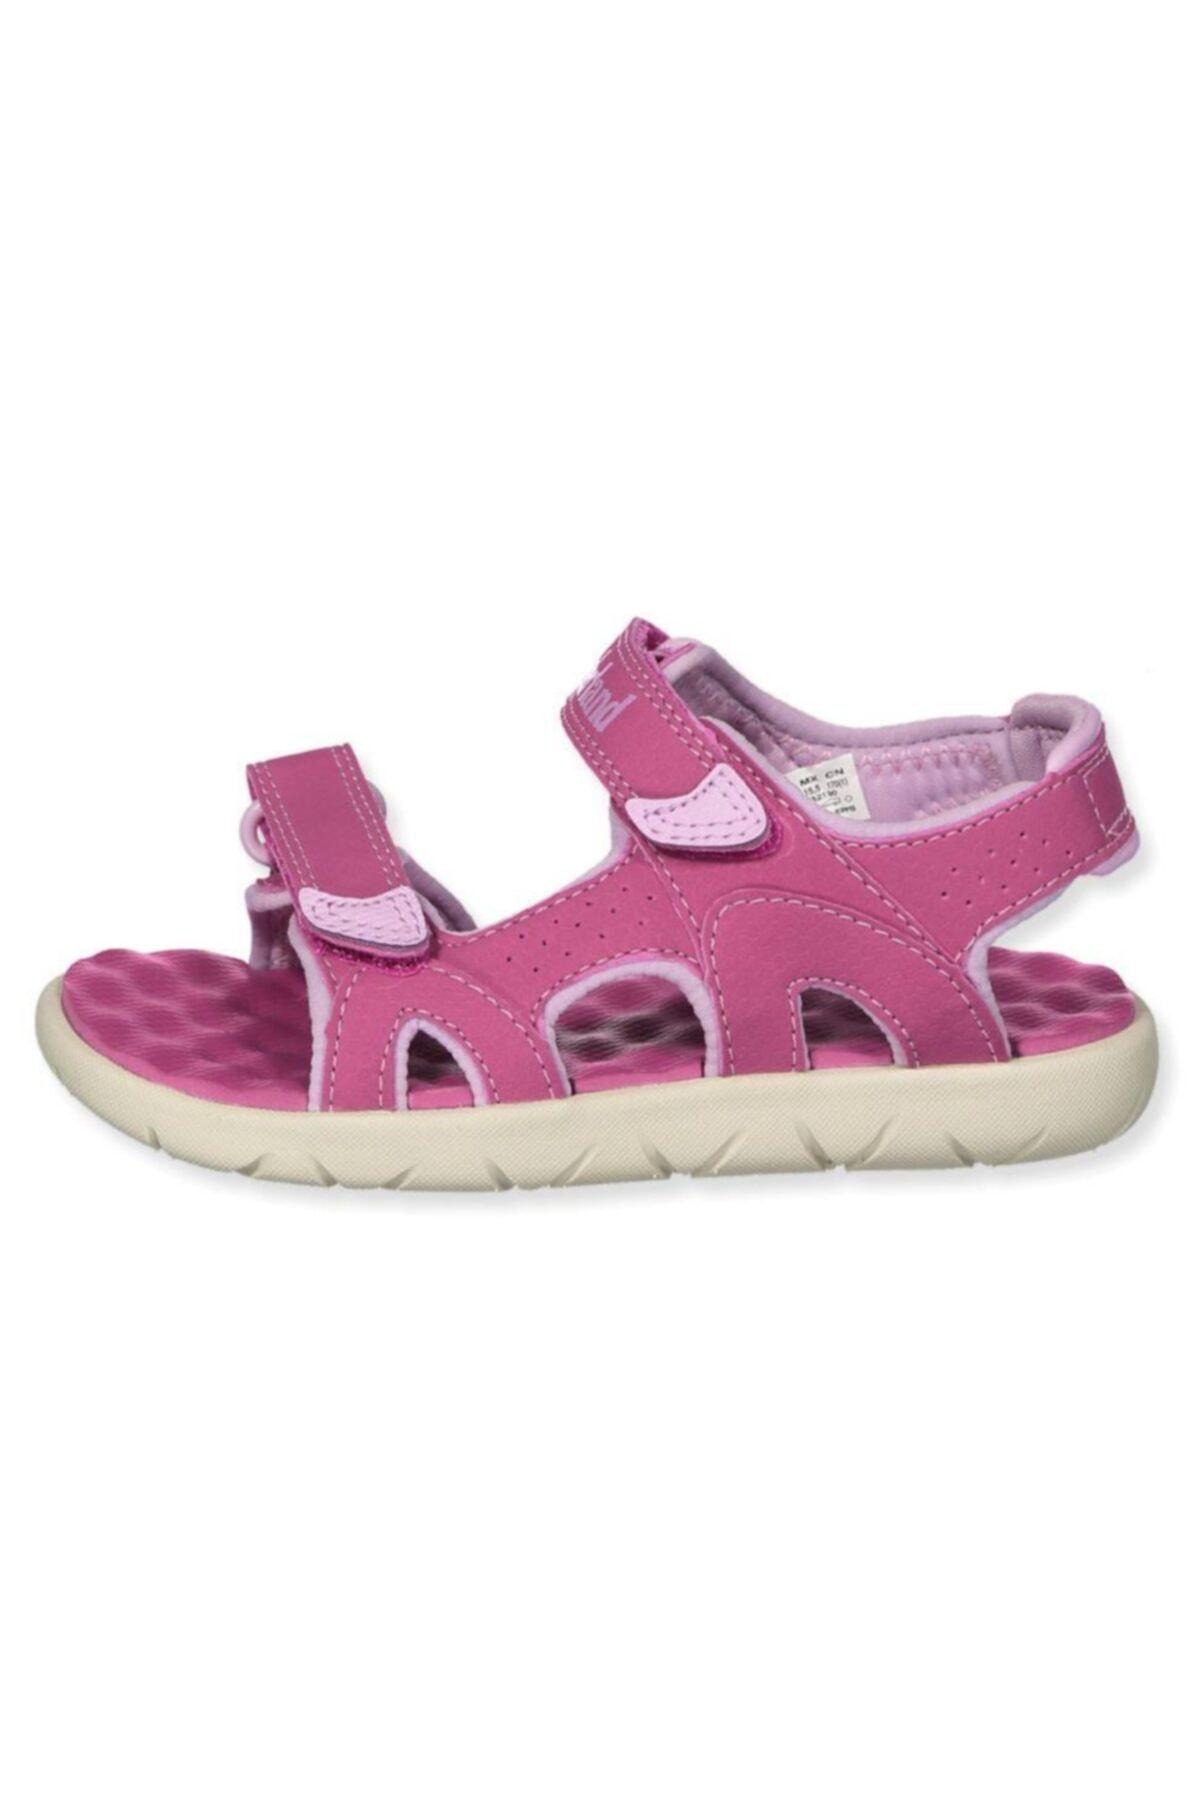 Timberland Perkins Row 2-strap Çocuk Sandalet Pembe 1